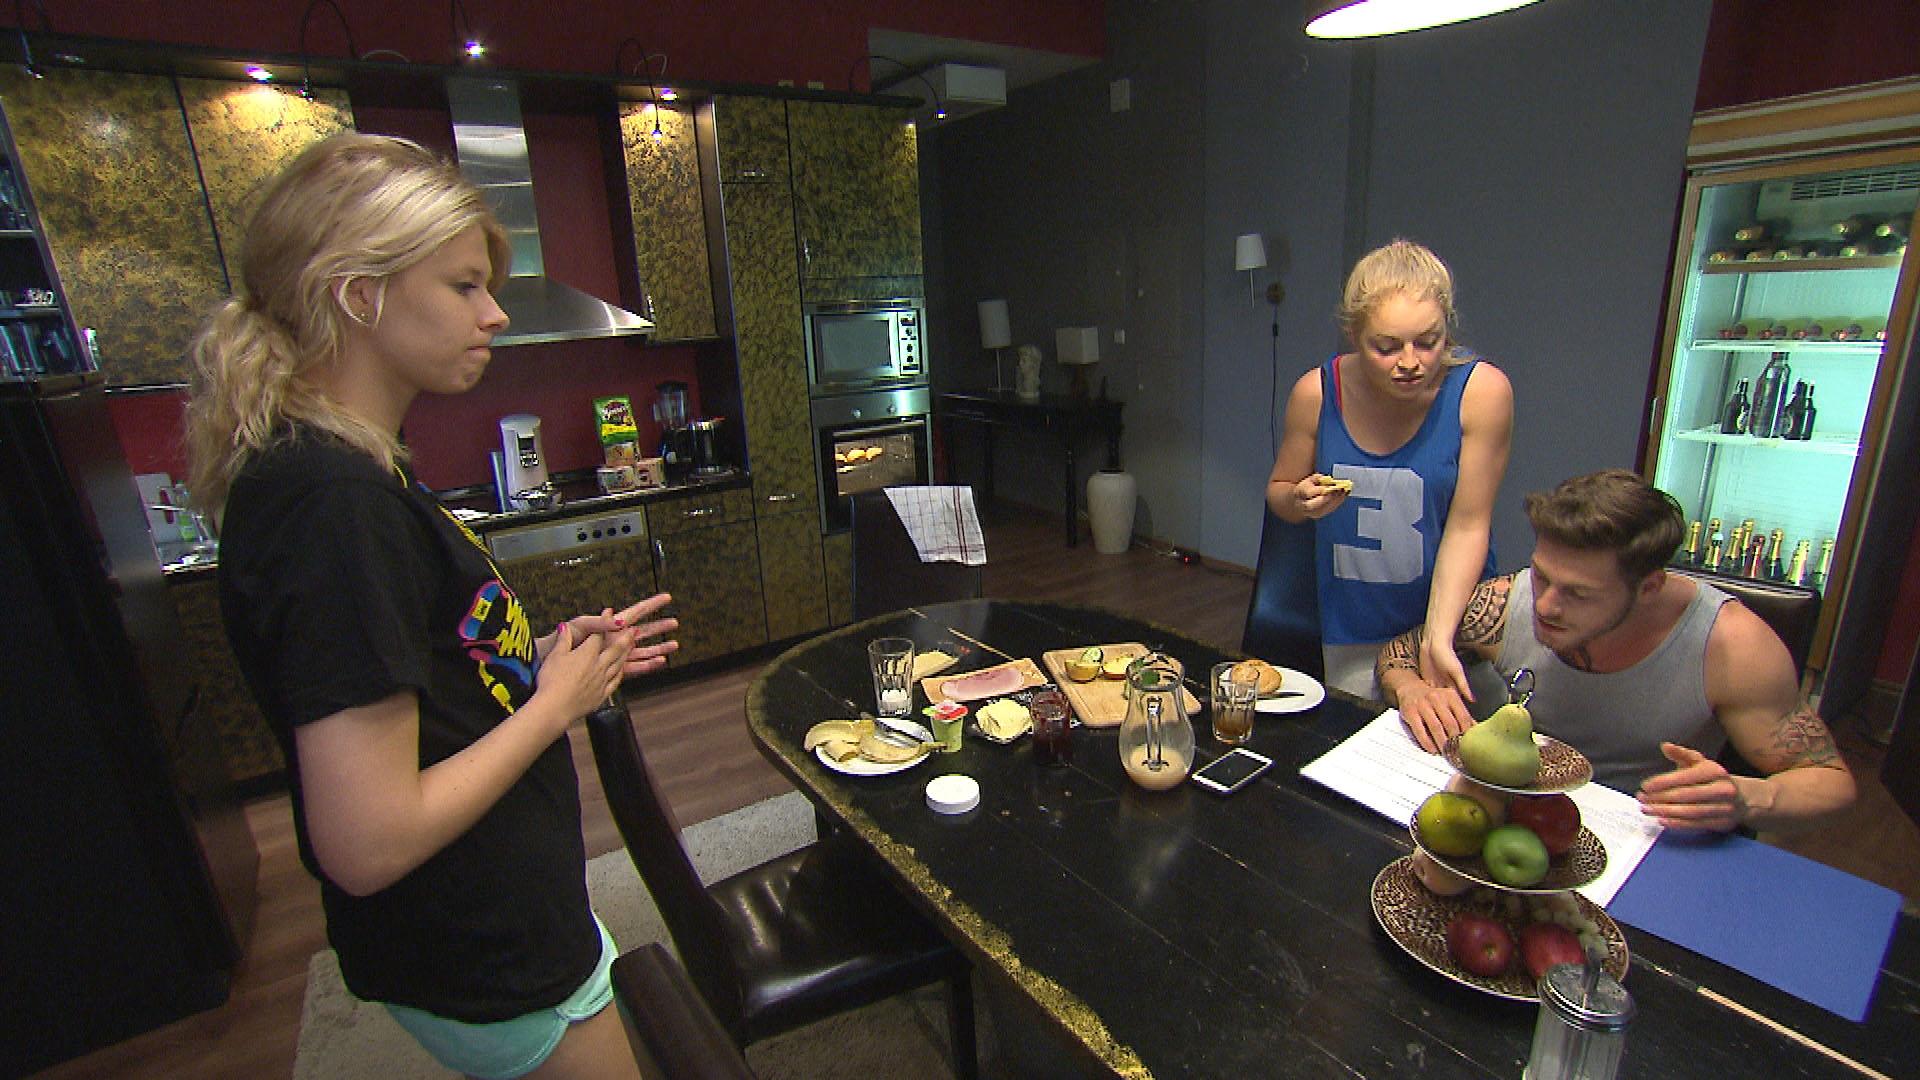 v.l.n.r.: Nina, Miri, Daniel (Quelle: RTL 2)